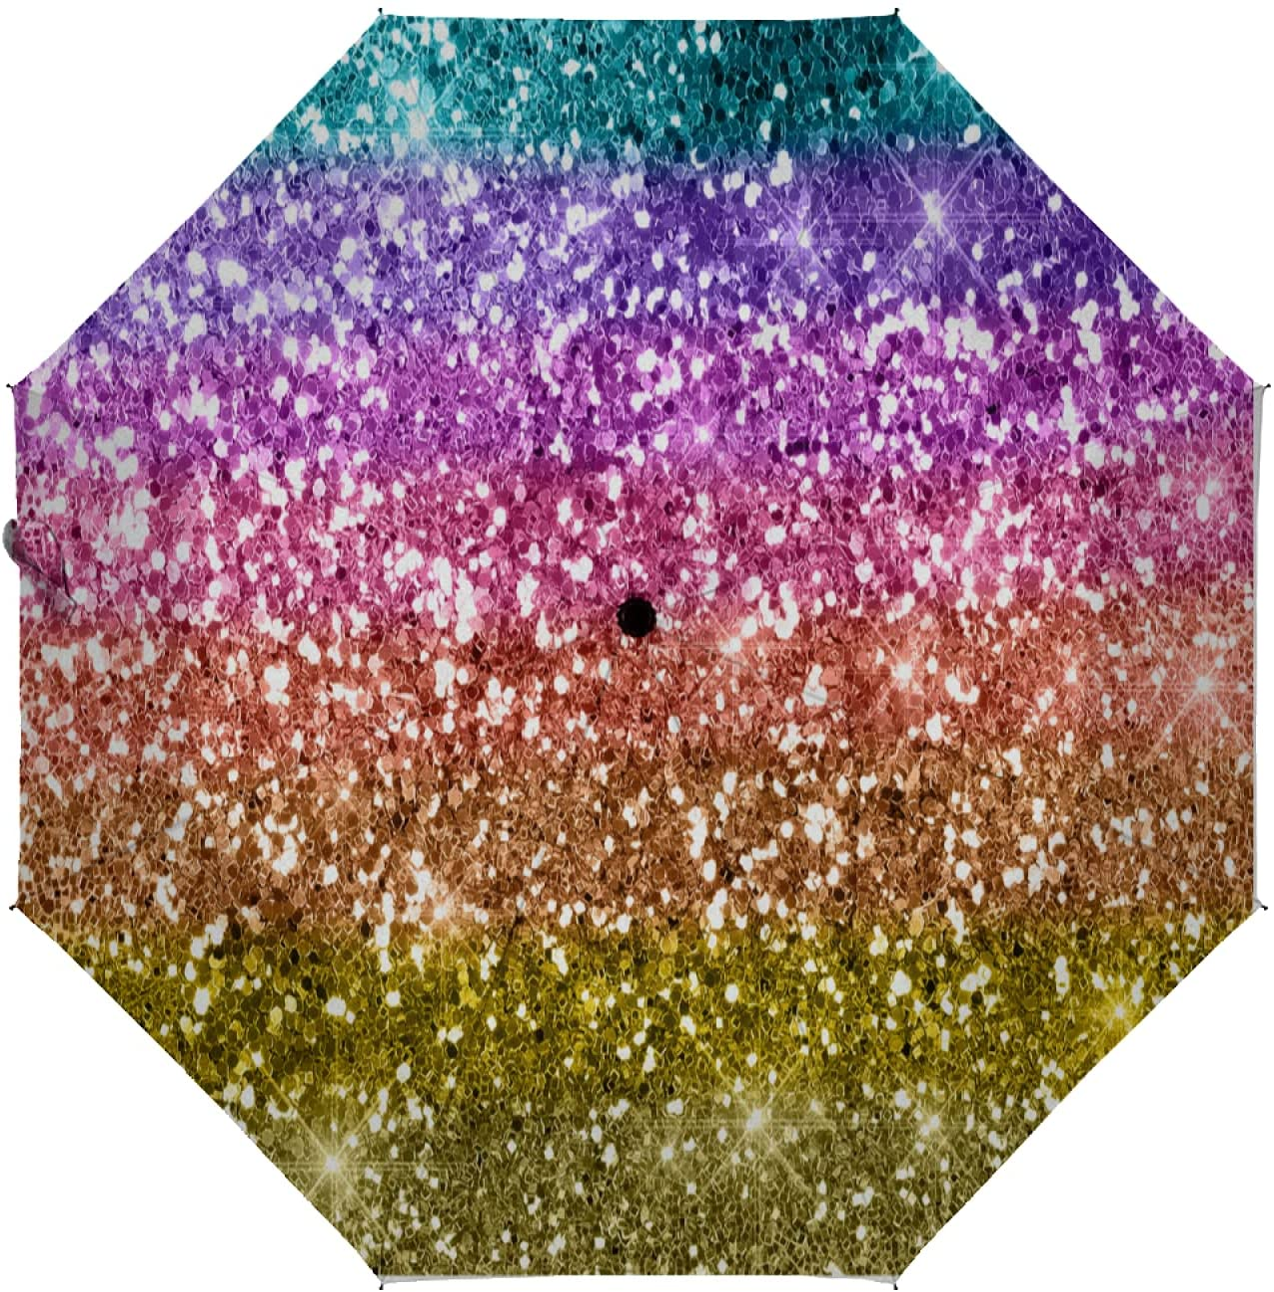 Max 79% OFF OcuteO Compact Umbrella Sale item Rainbow Spiral Hippie Boho Dye Tie Auto